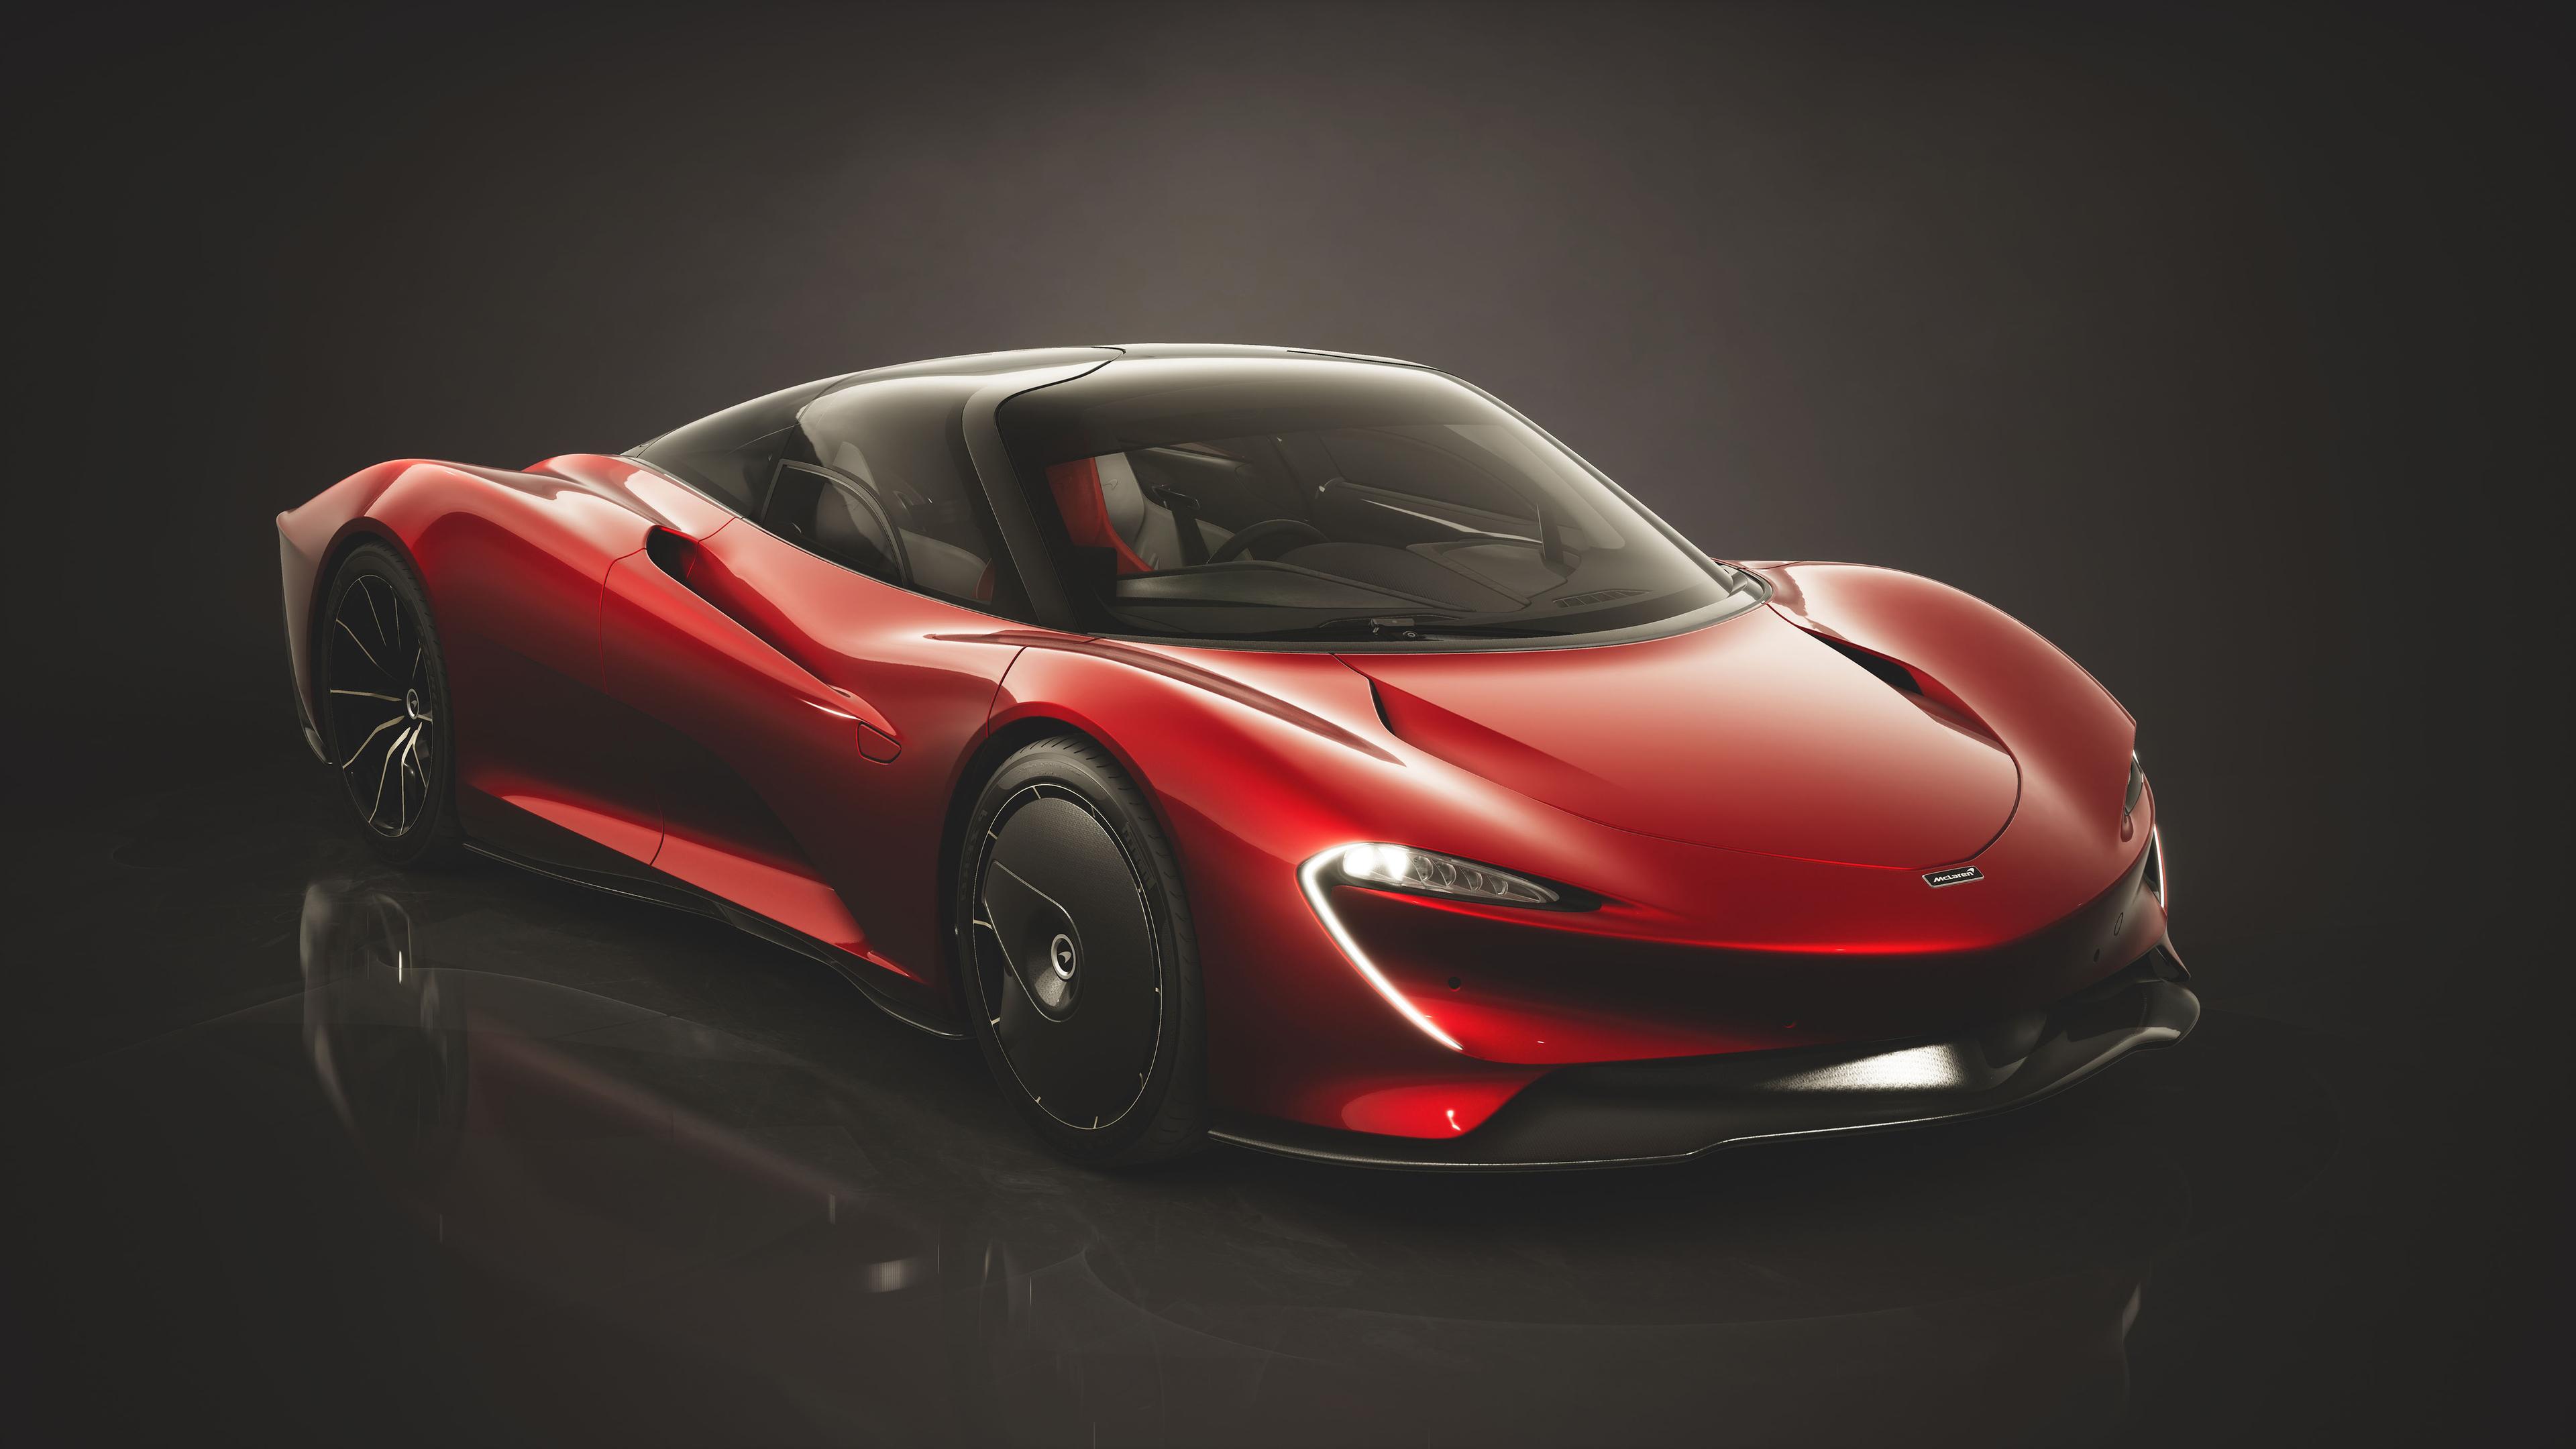 mclaren speedtail 2019 4k 1547936910 - McLaren Speedtail 2019 4k - mclaren speedtail wallpapers, hd-wallpapers, cars wallpapers, 4k-wallpapers, 2018 cars wallpapers